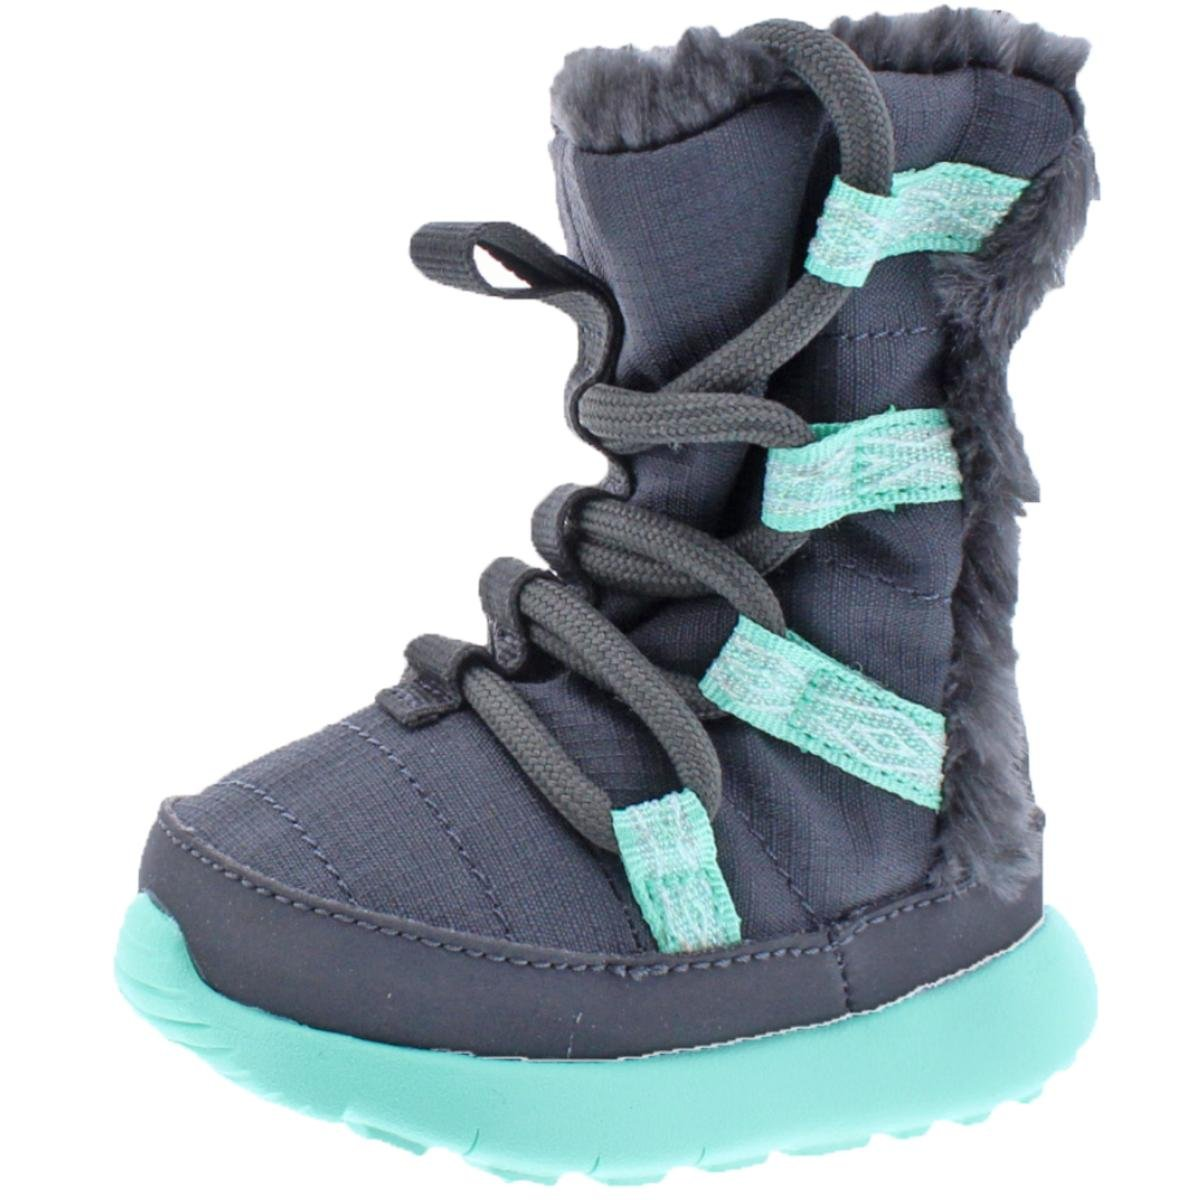 new arrival 3909c 15ebb Amazon.com | Nike Roshe One HI SE Infant Lightweight Boots ...